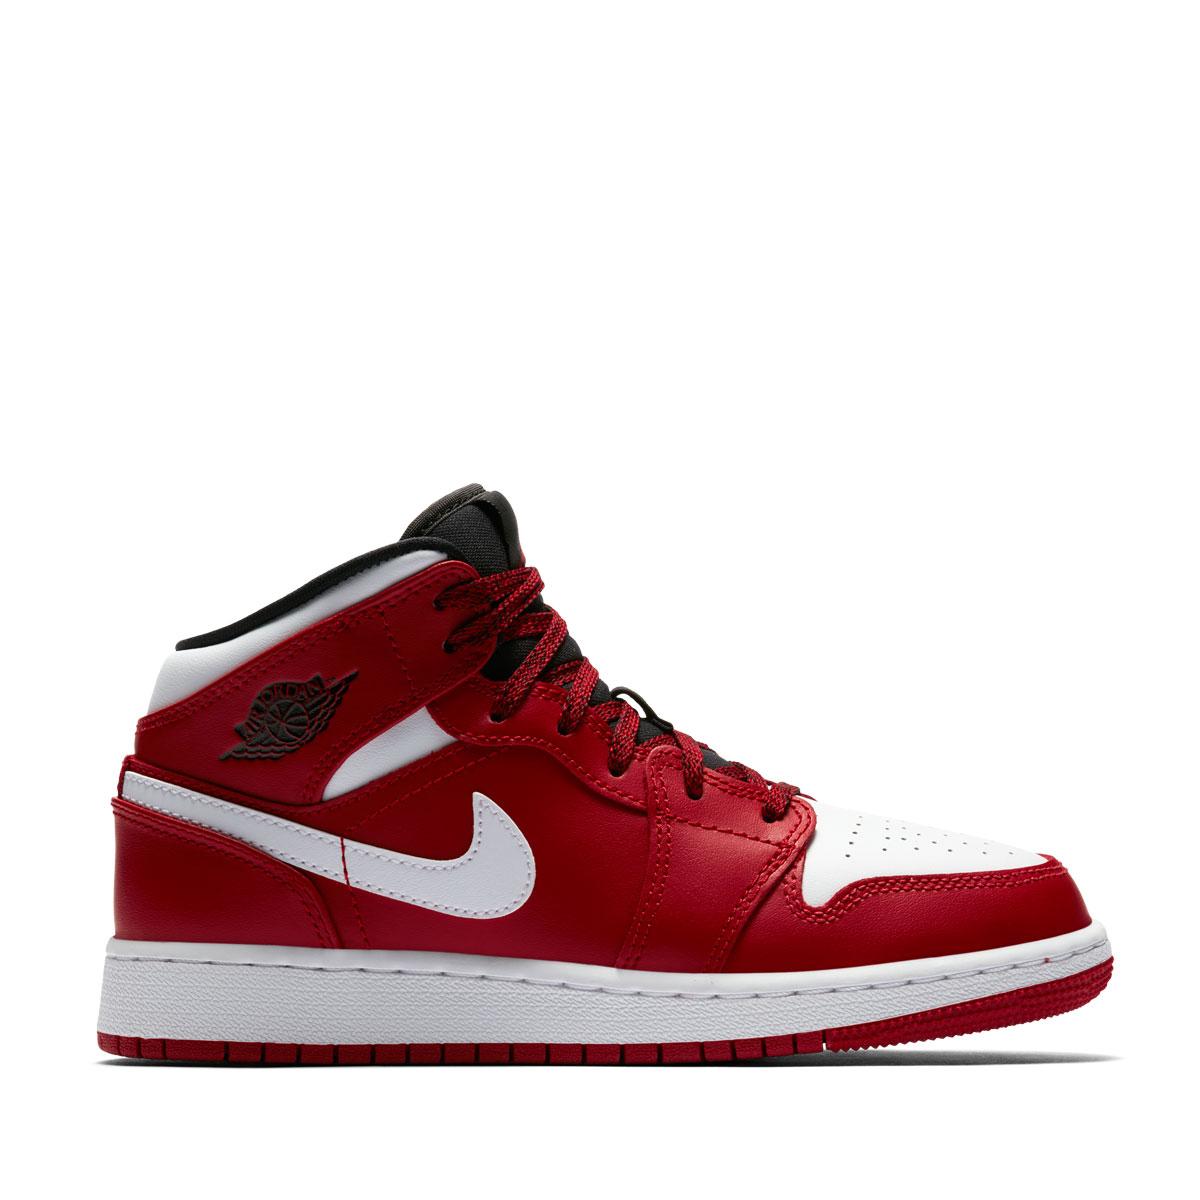 sale retailer c2b85 3fc1f ... NIKE AIR JORDAN 1 MID BG (Nike Air Jordan 1 mid BG) GYM RED ...